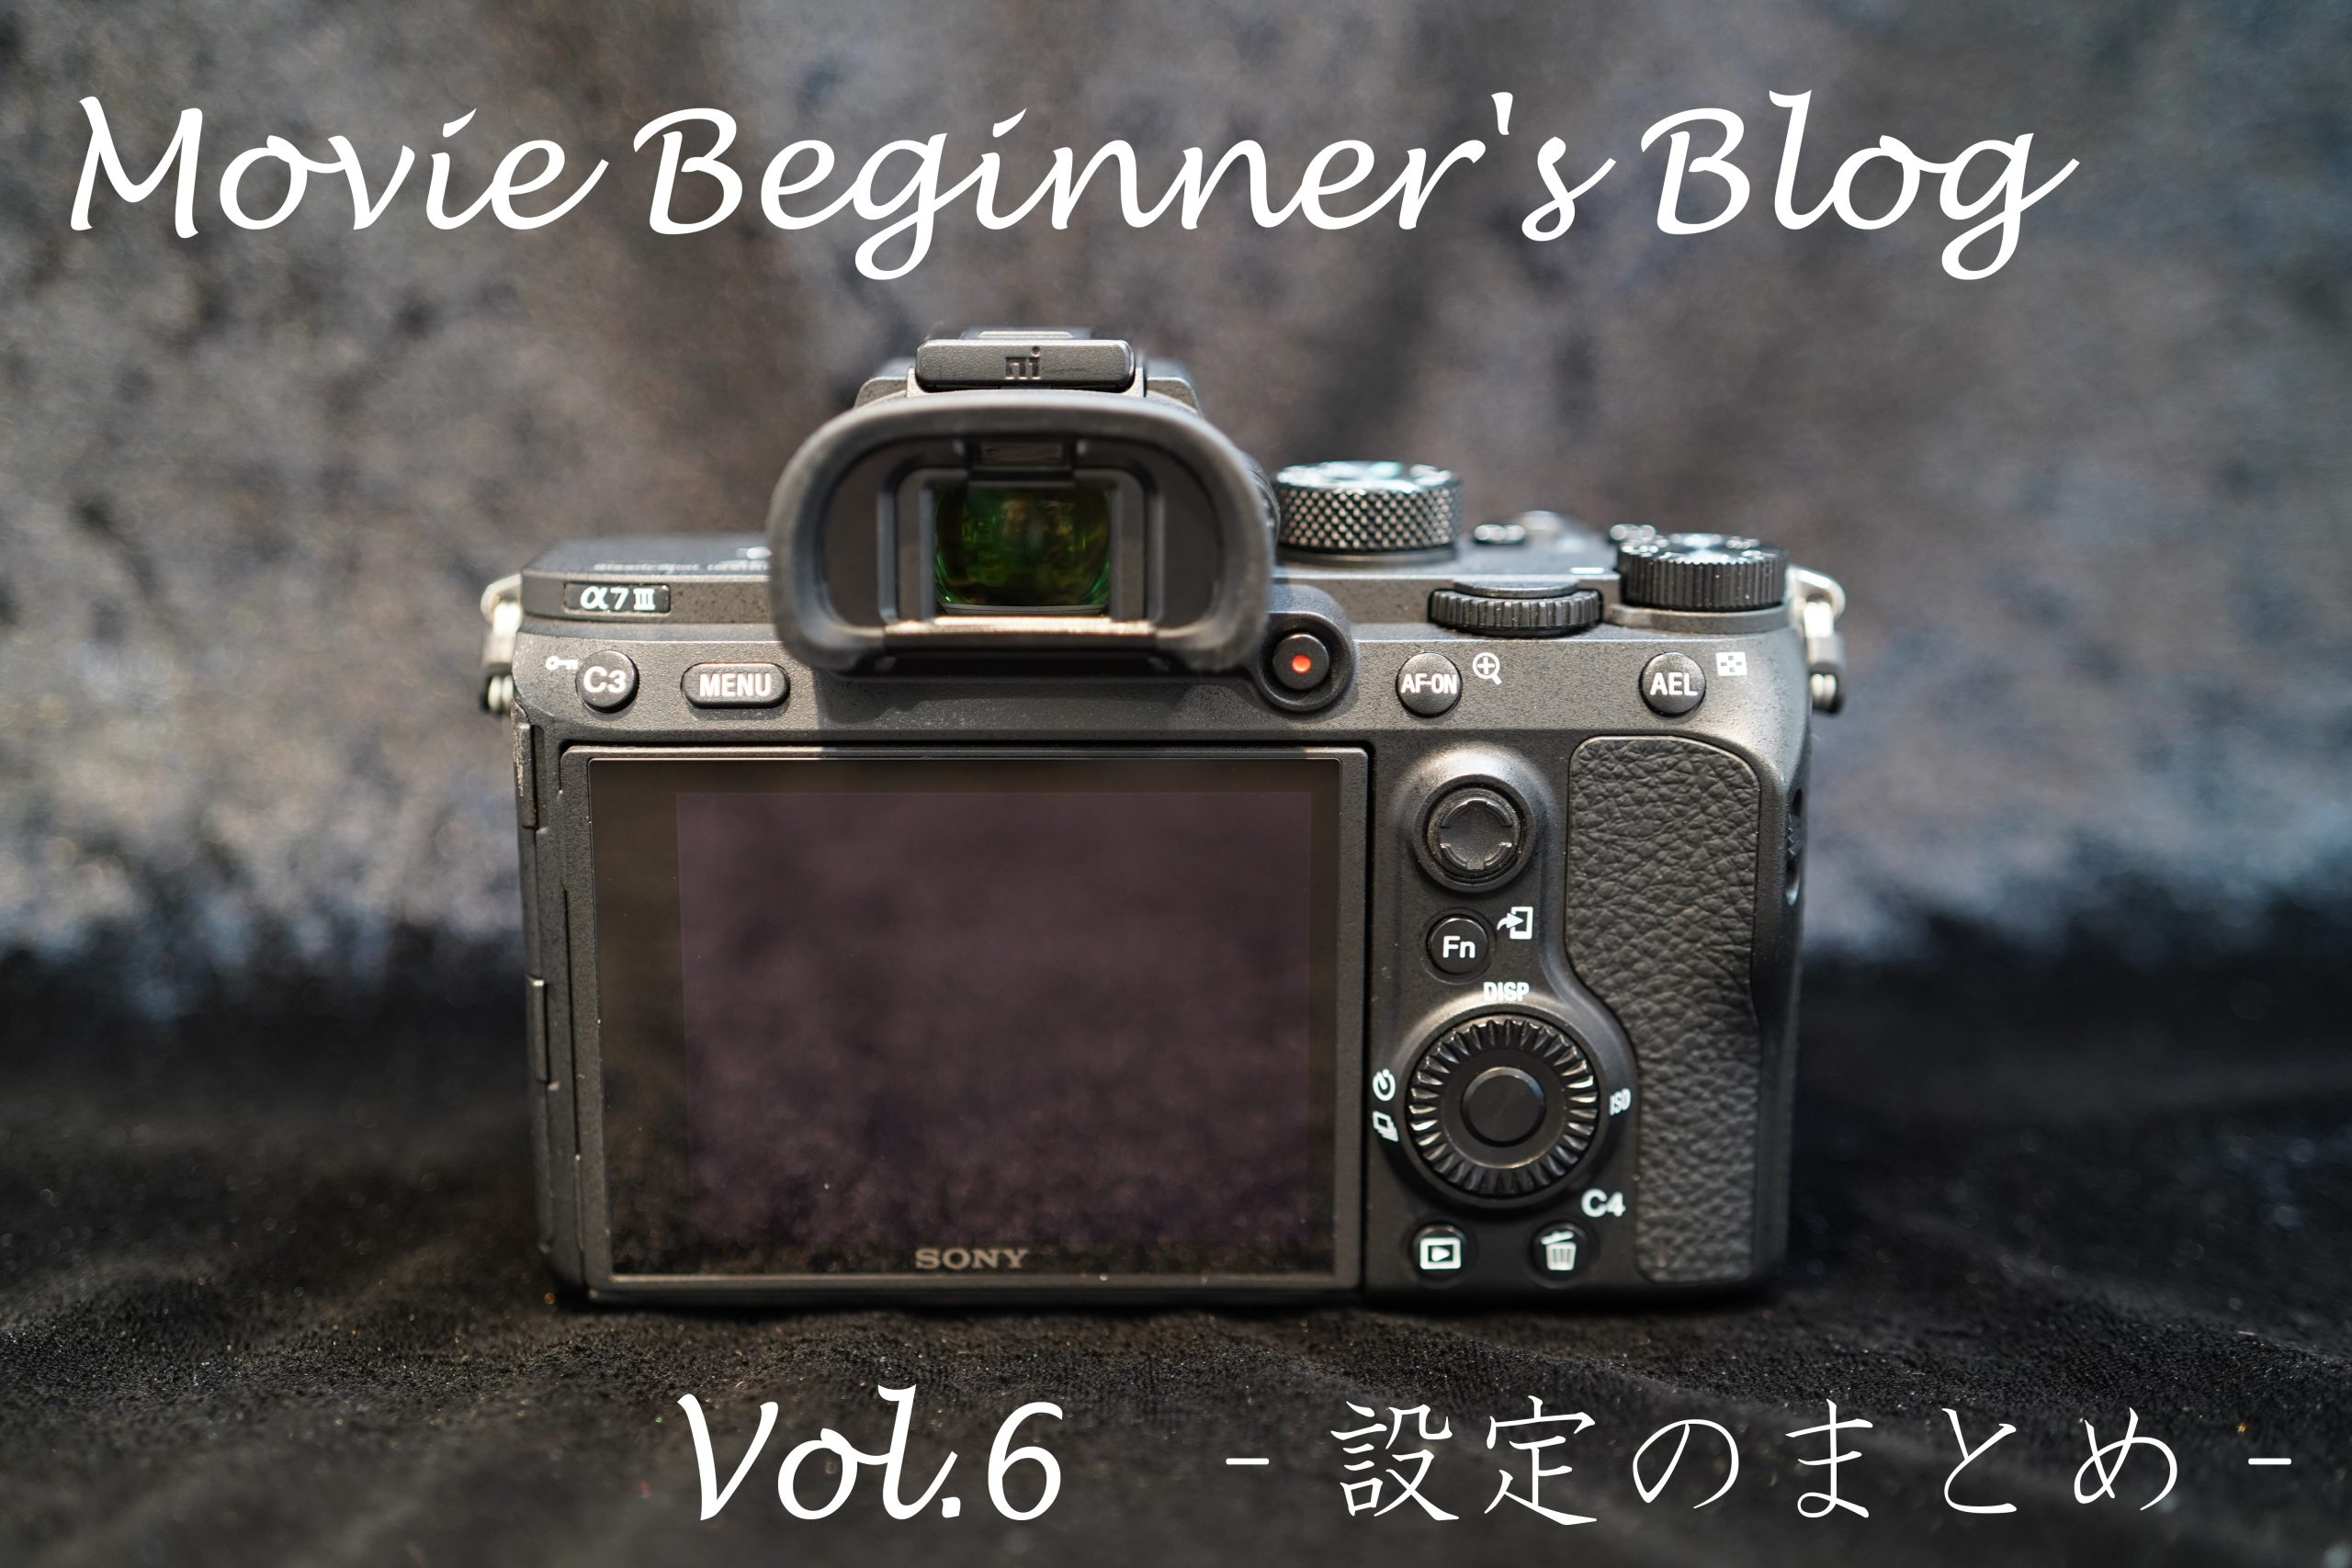 【SONY】Movie Beginner's Blog Vol.6 -設定のまとめ-